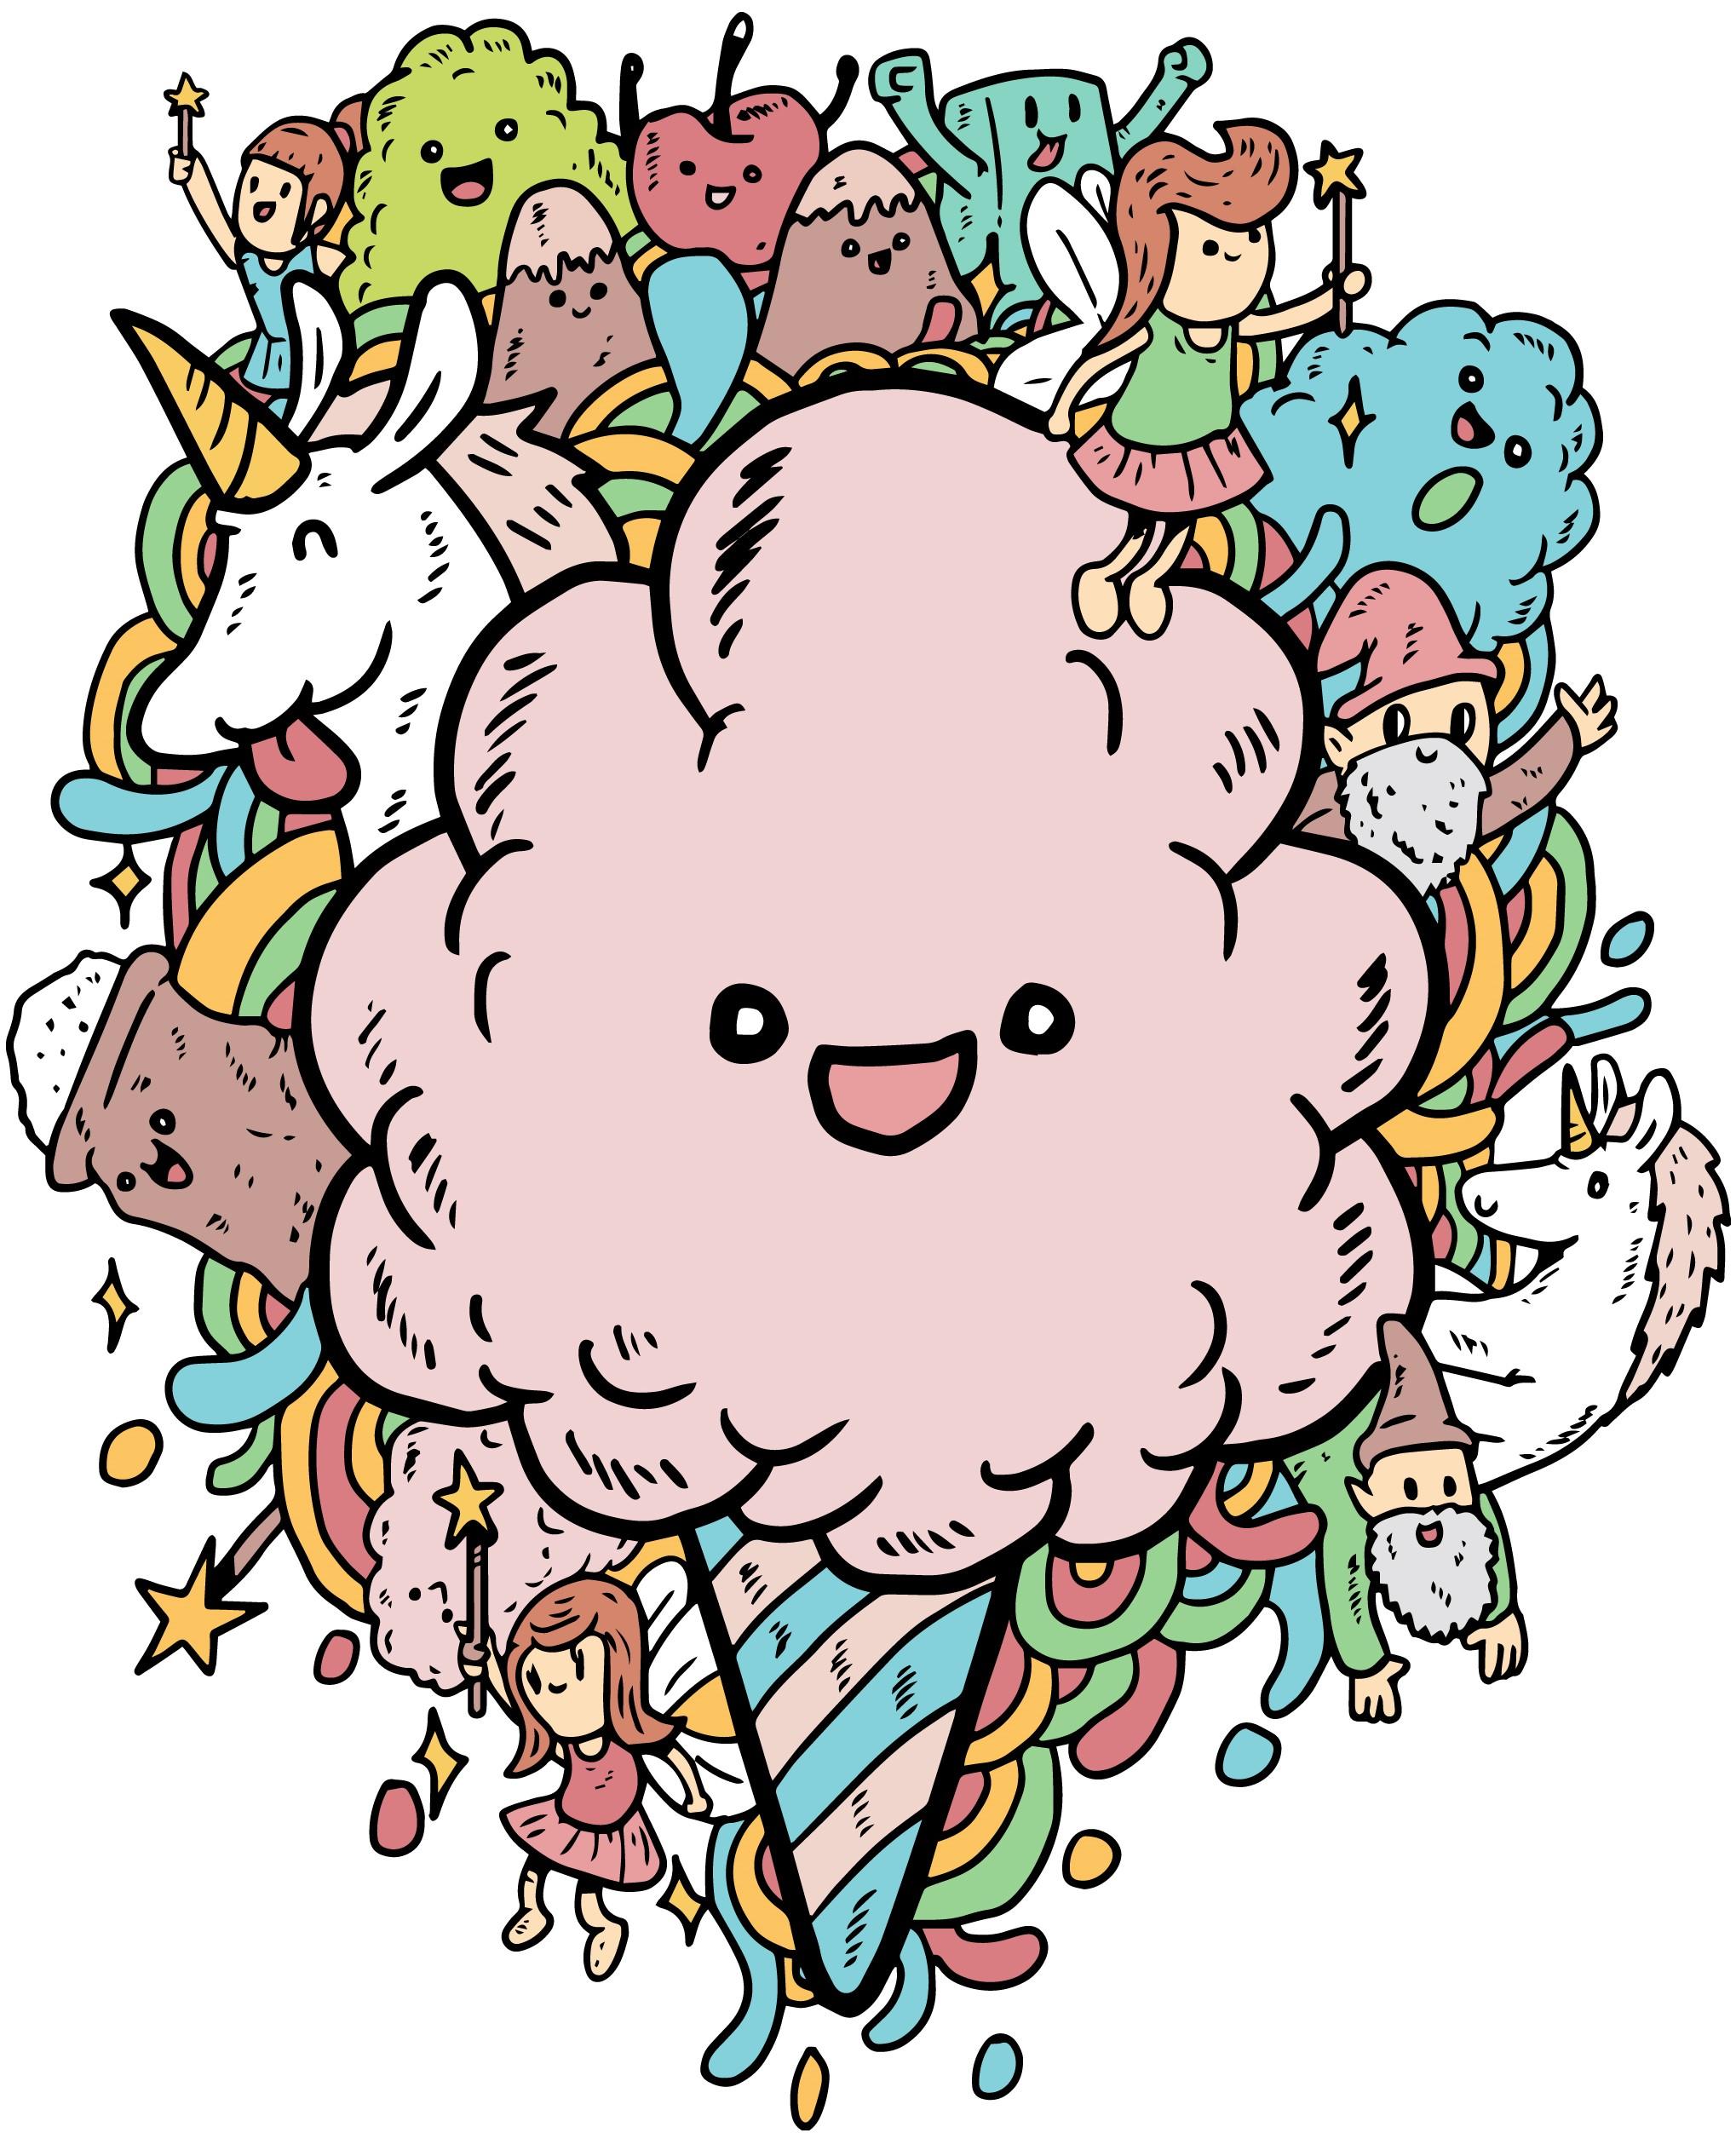 Sugarii-doodle-1.jpg